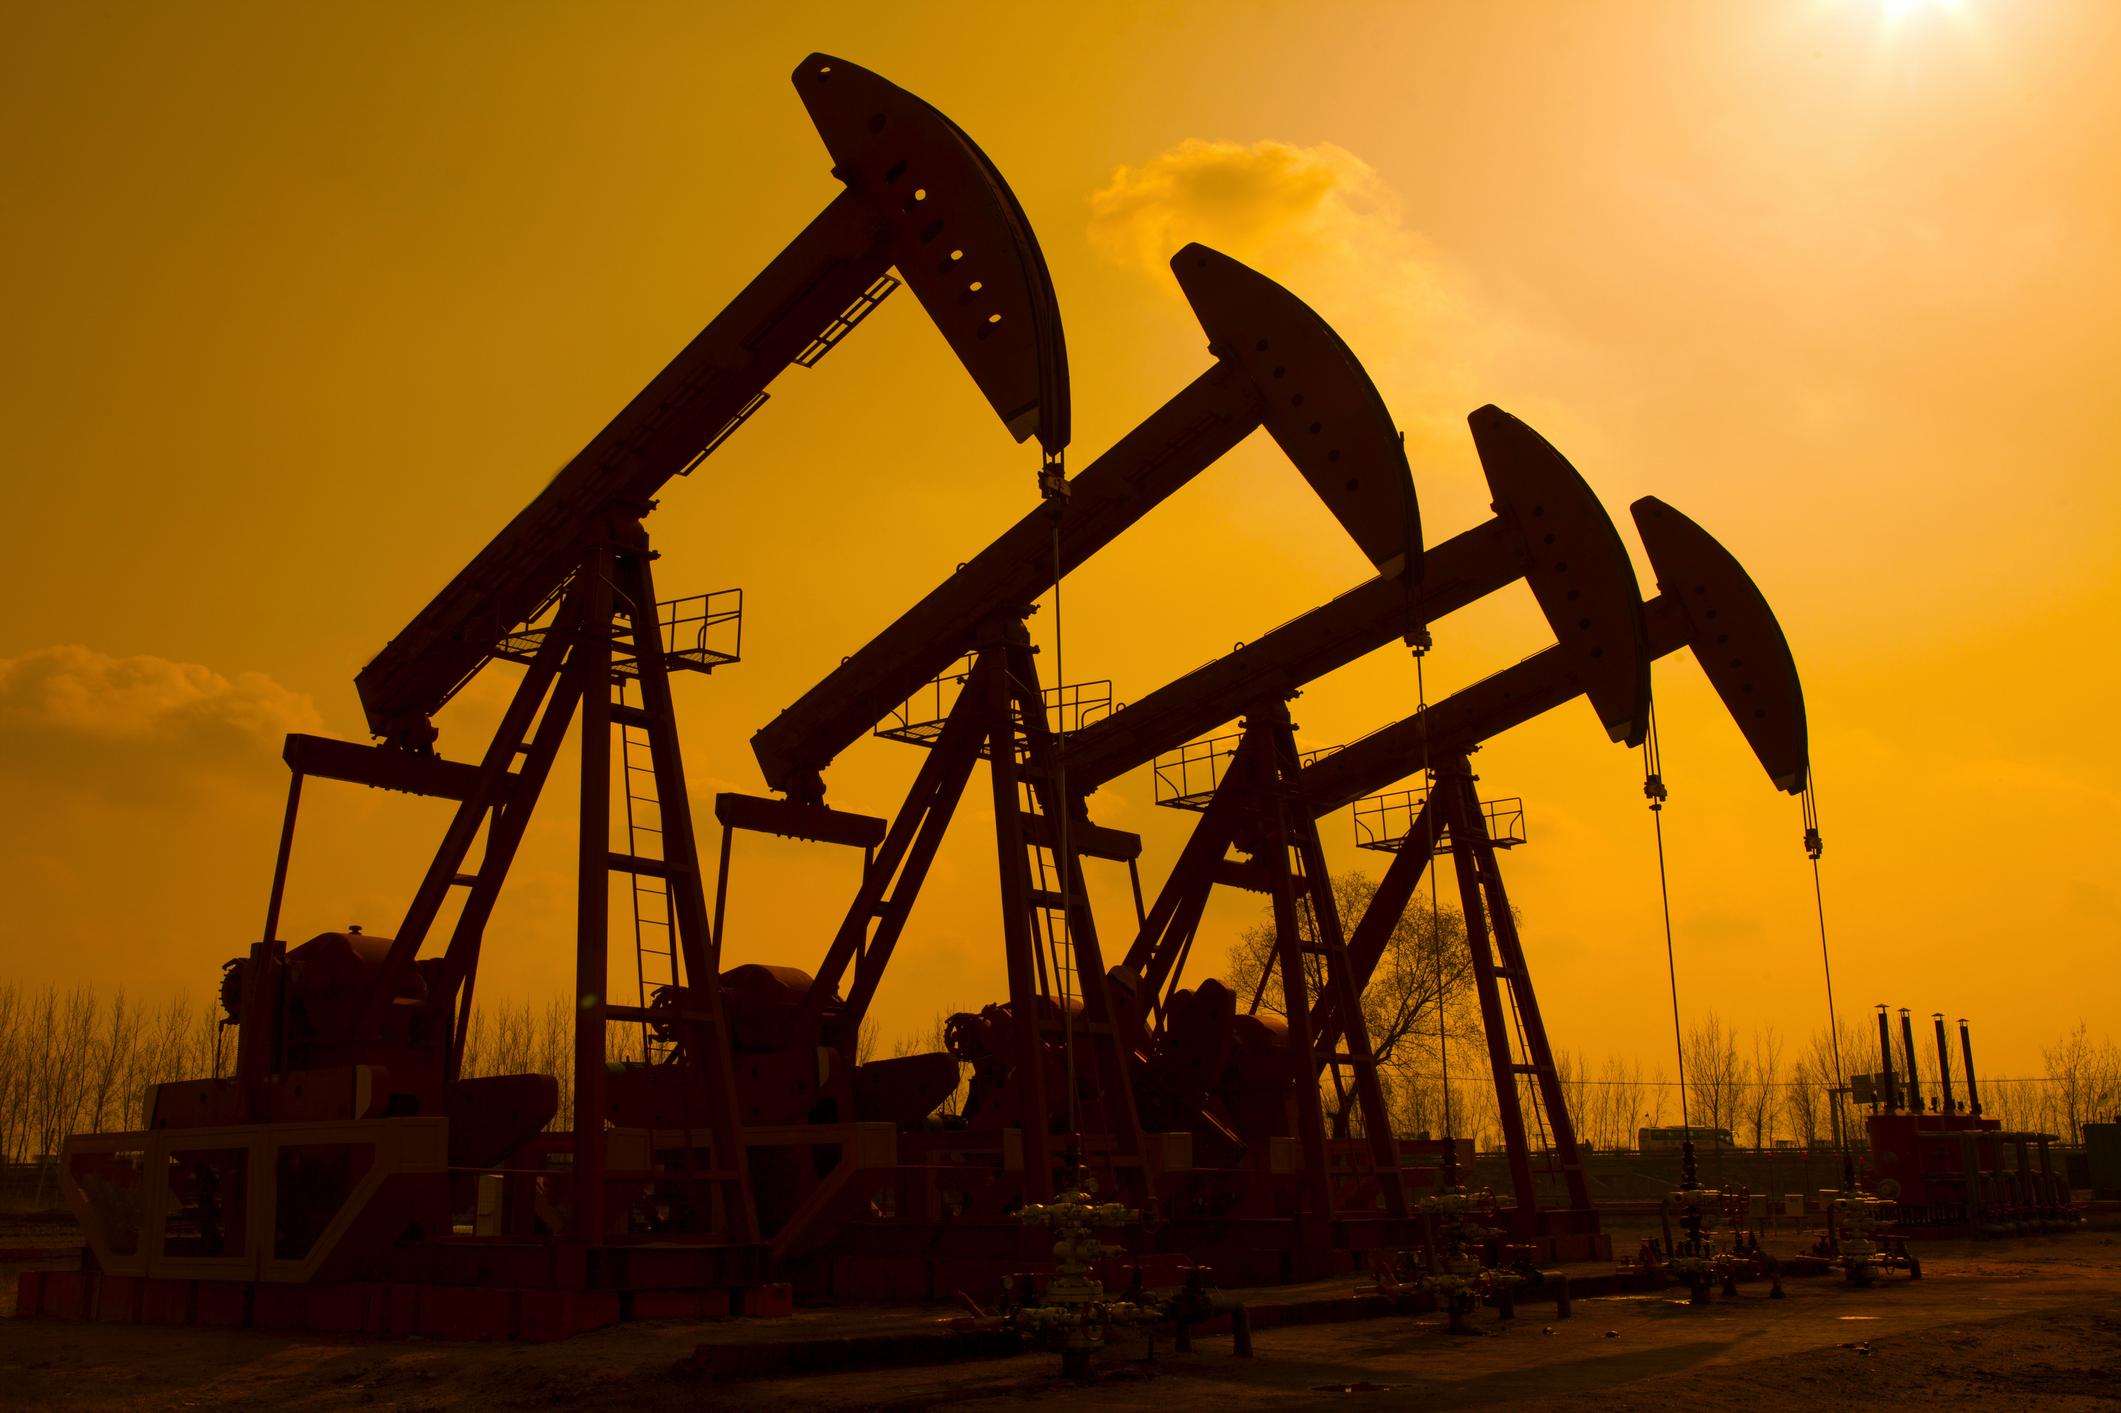 Oil wells.